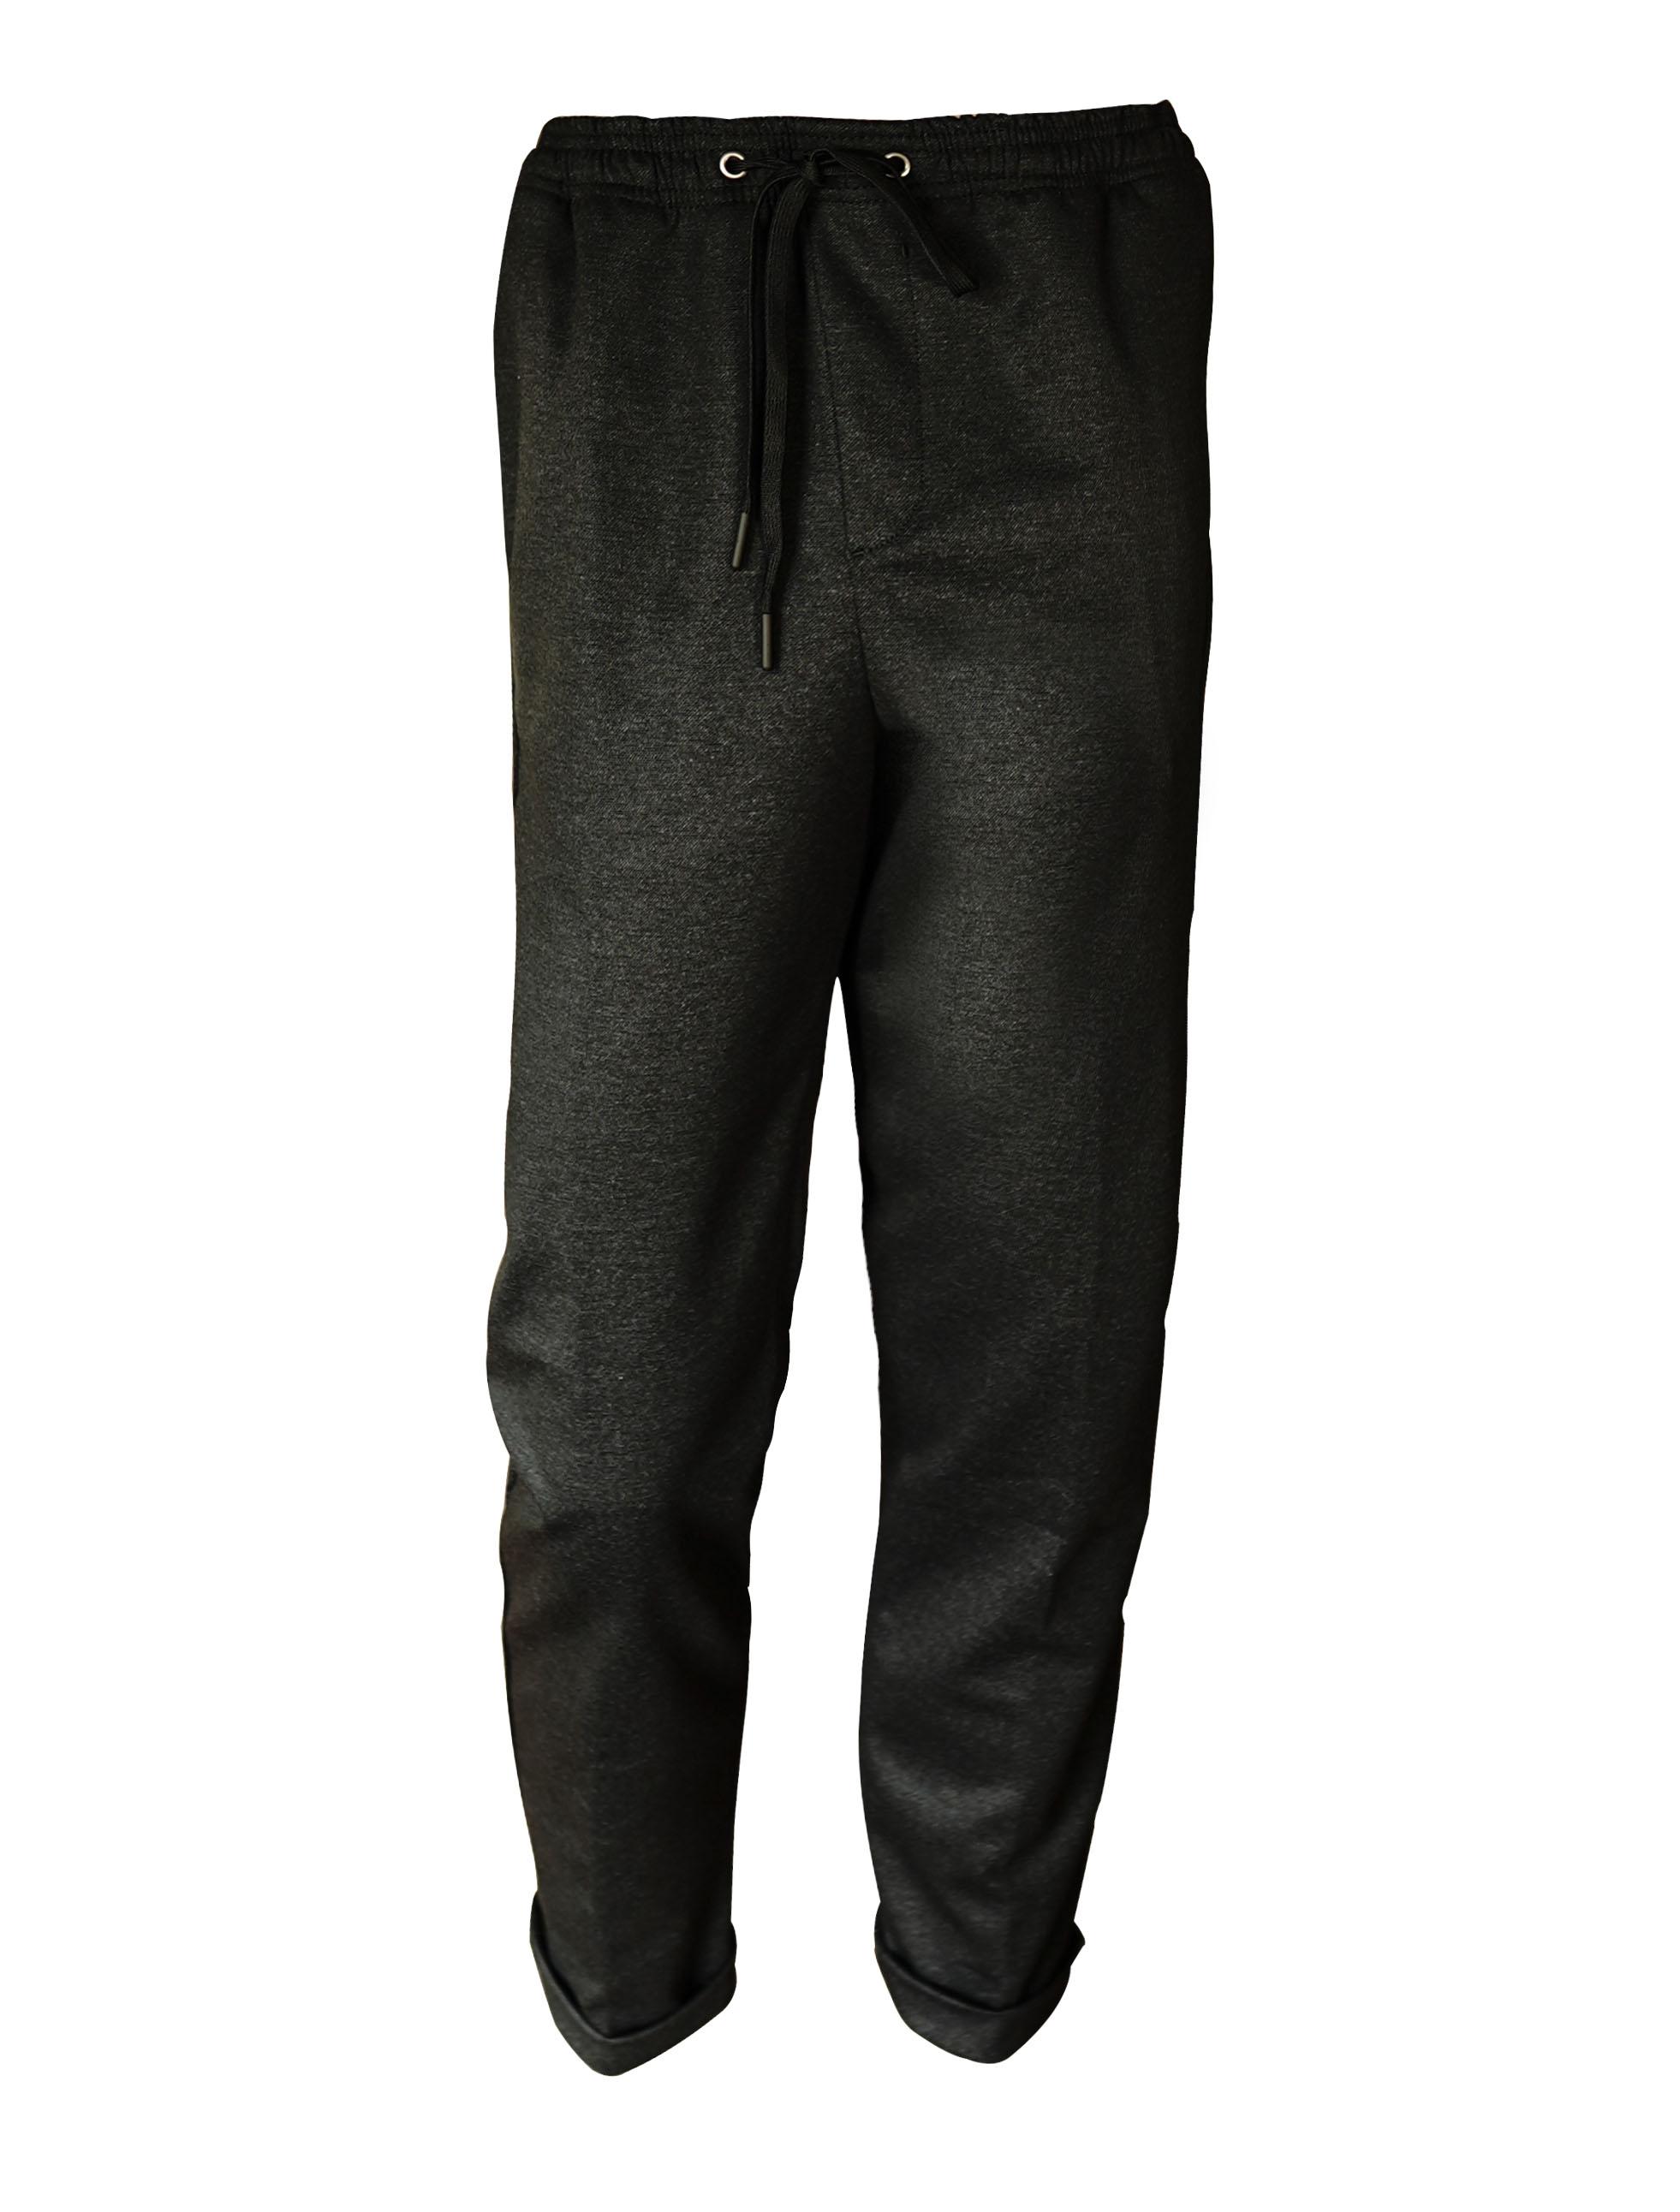 B700 | Trousers | MH713 202943